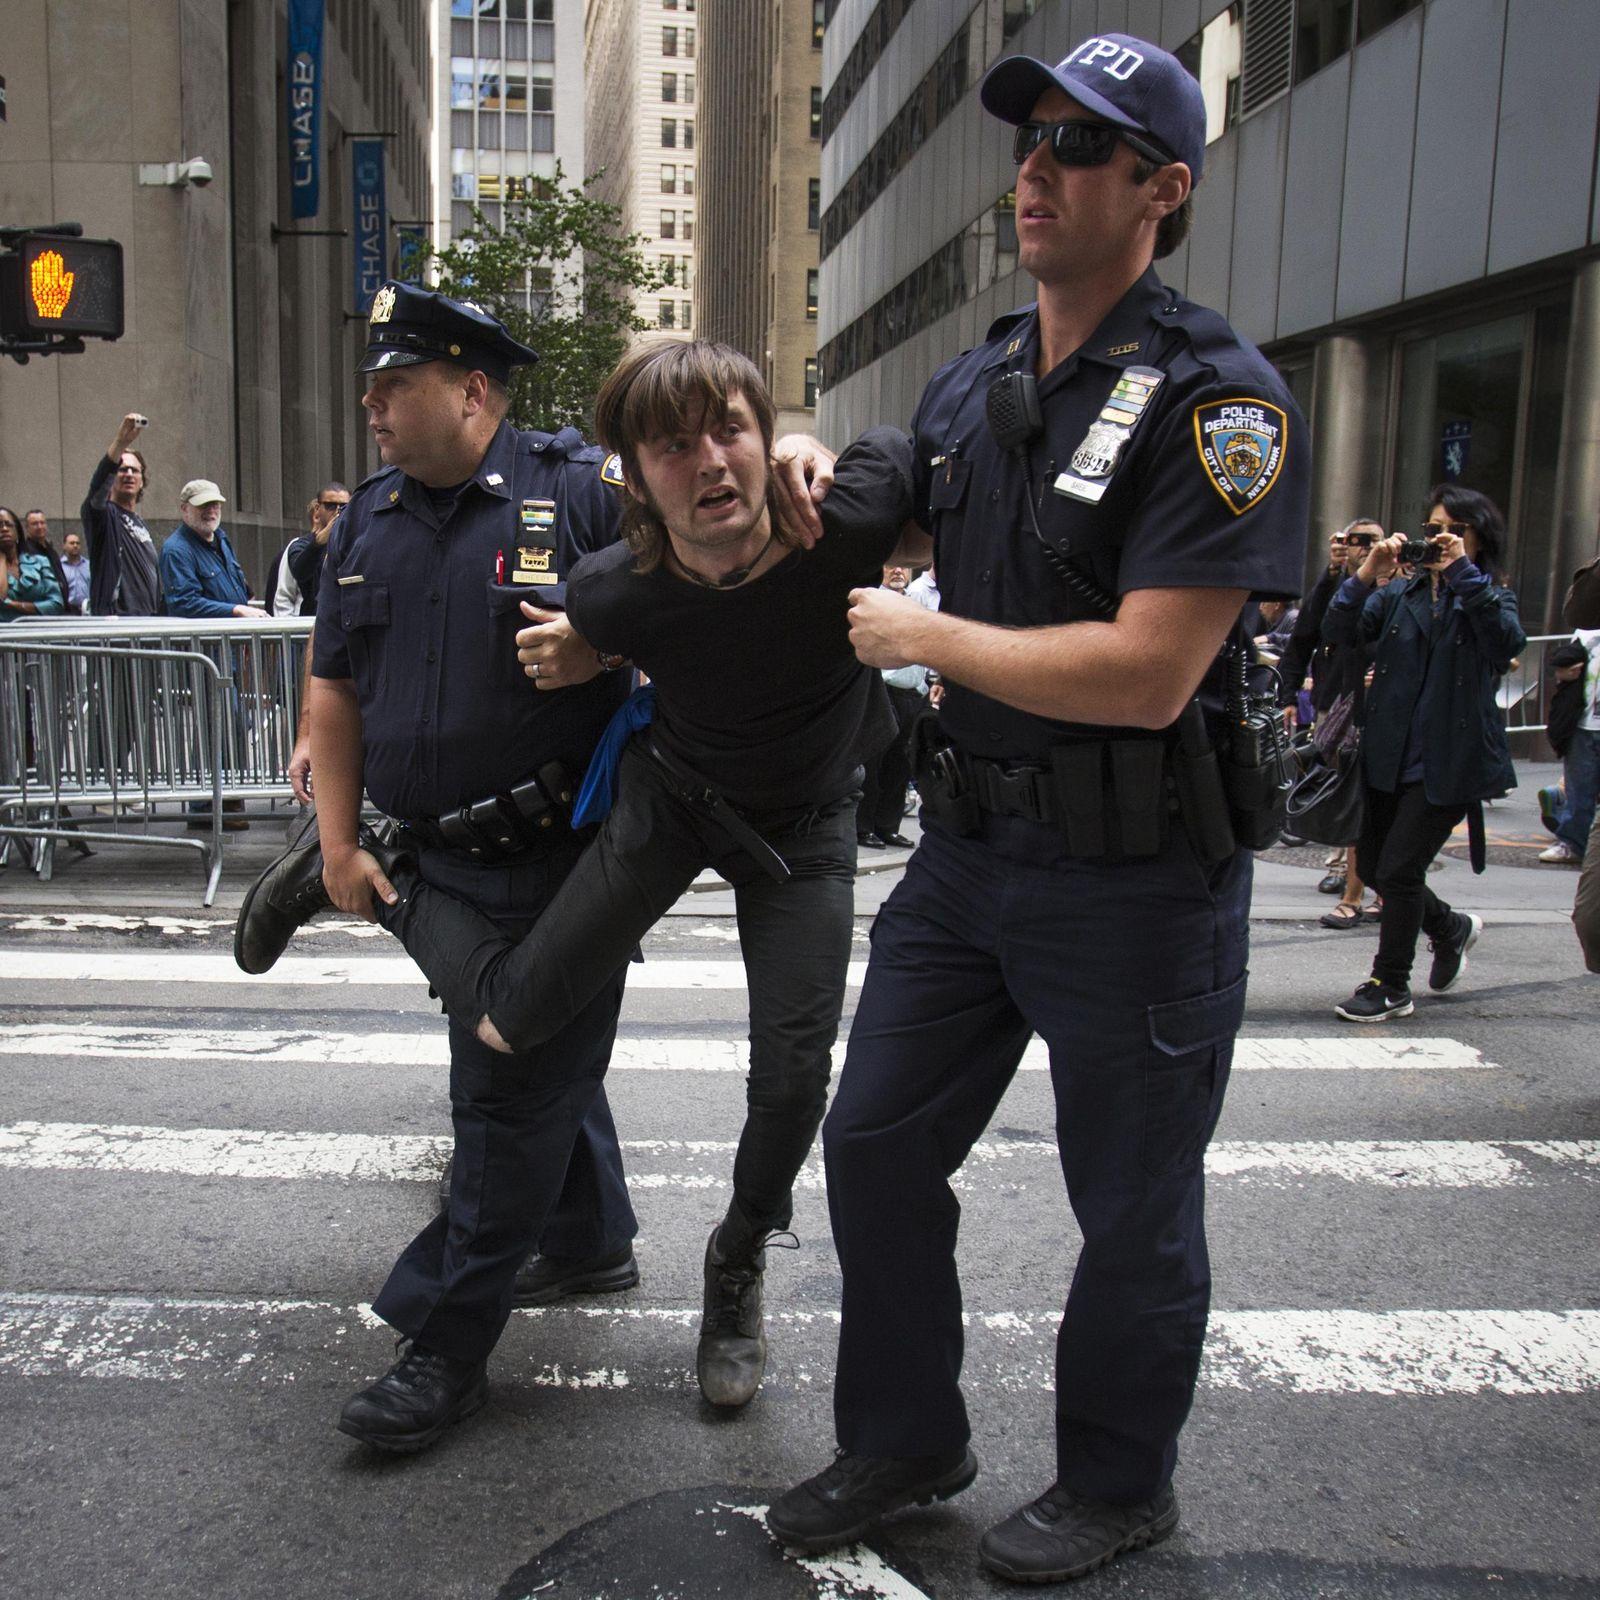 Flood Wall Street/New York